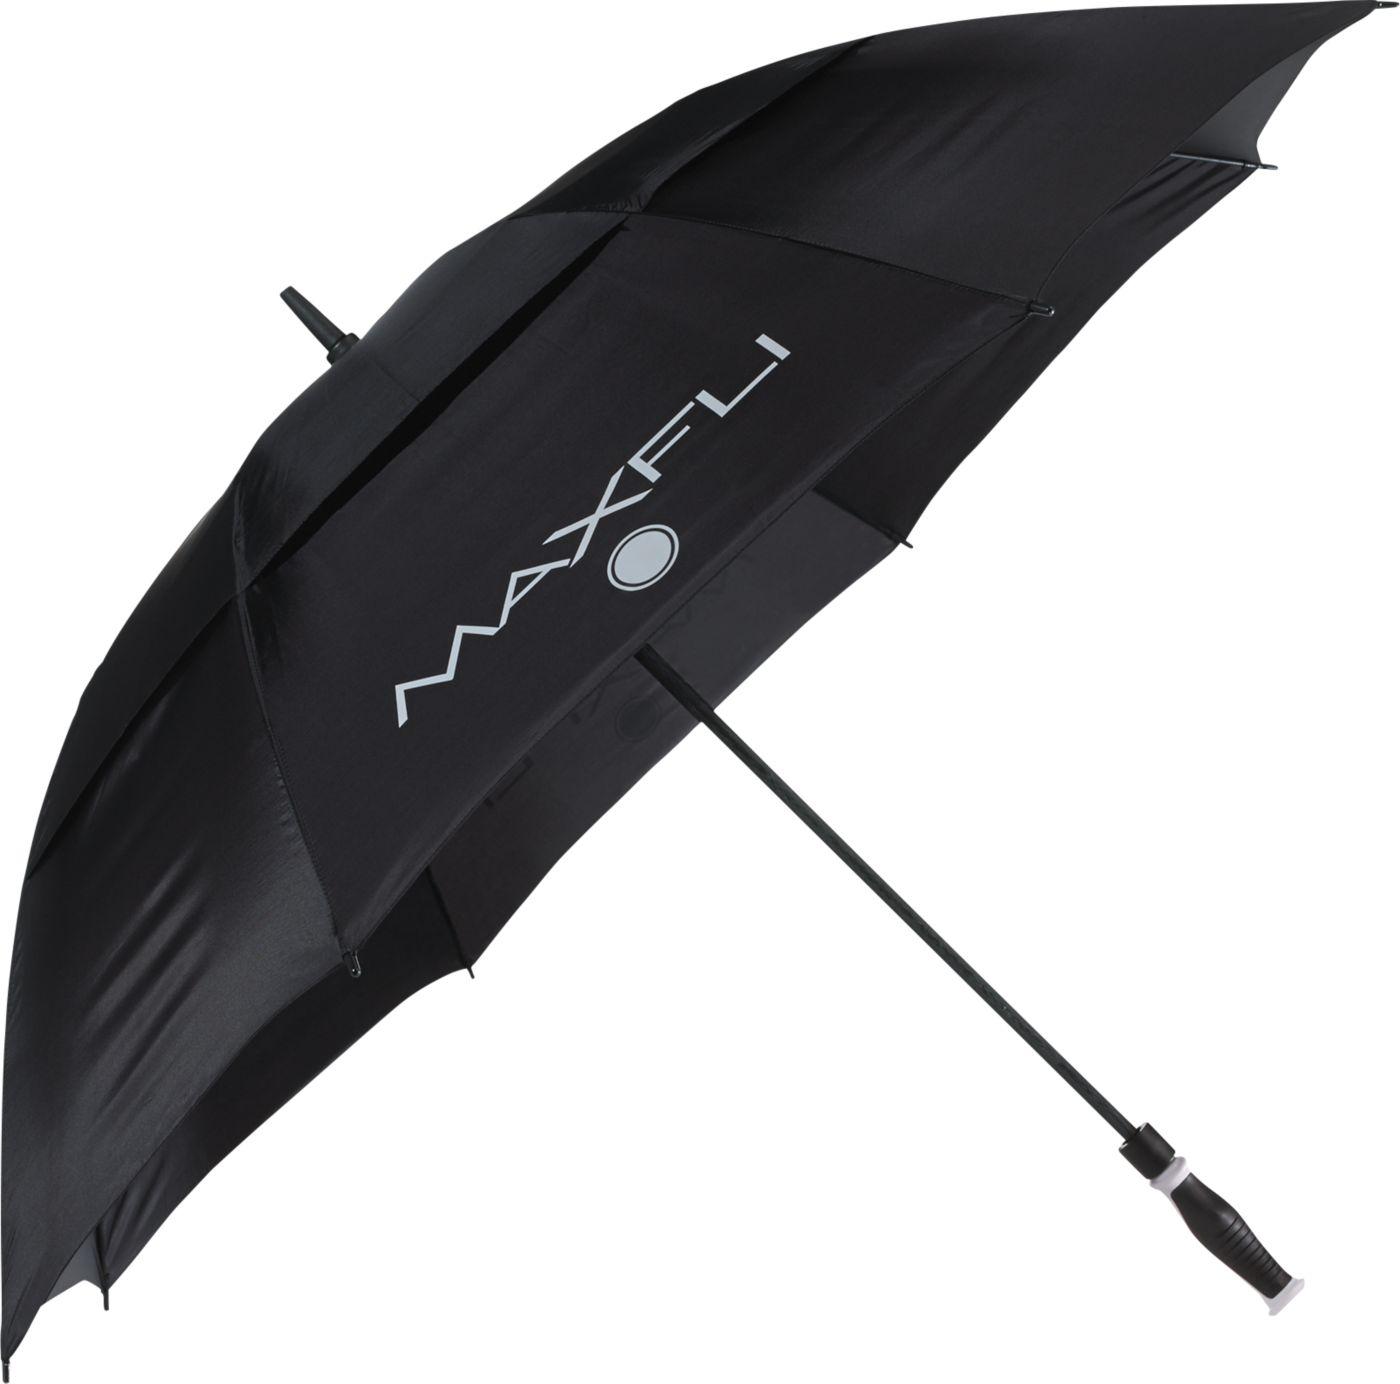 Maxfli 68'' Golf Umbrella